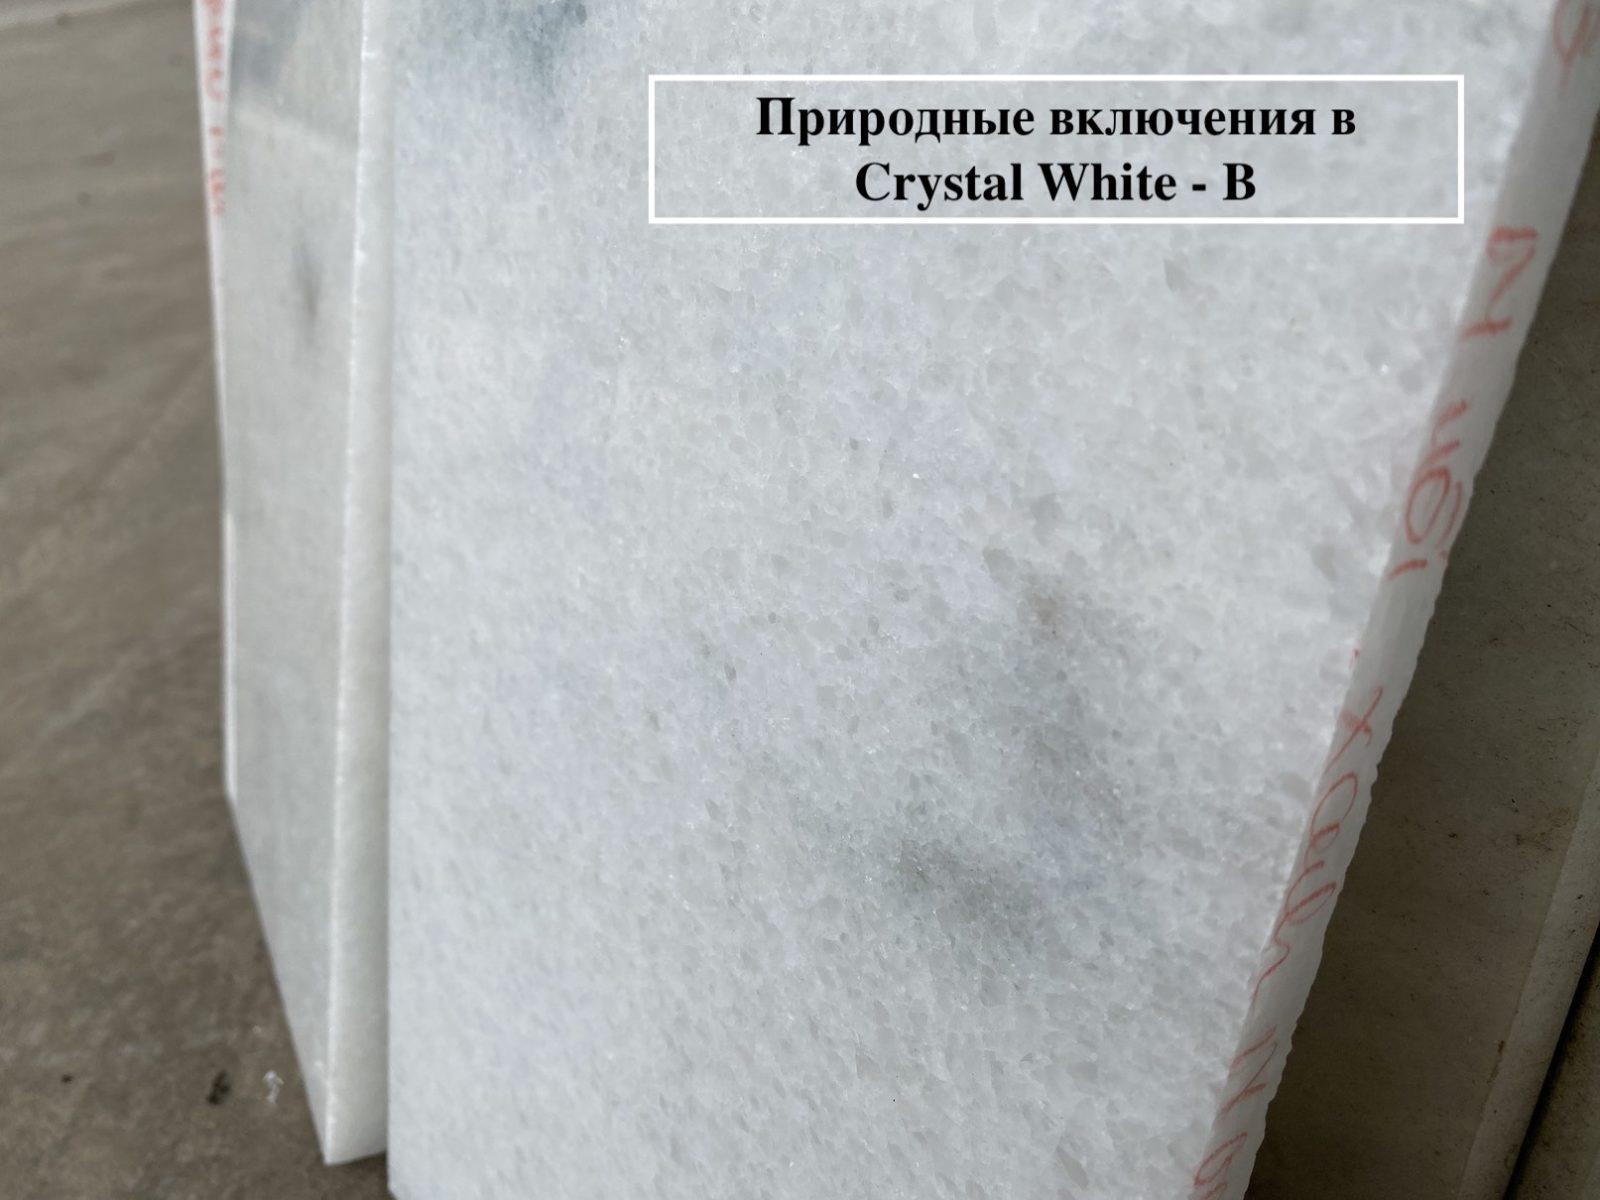 Crystal White фото 5f990dc1d1c11